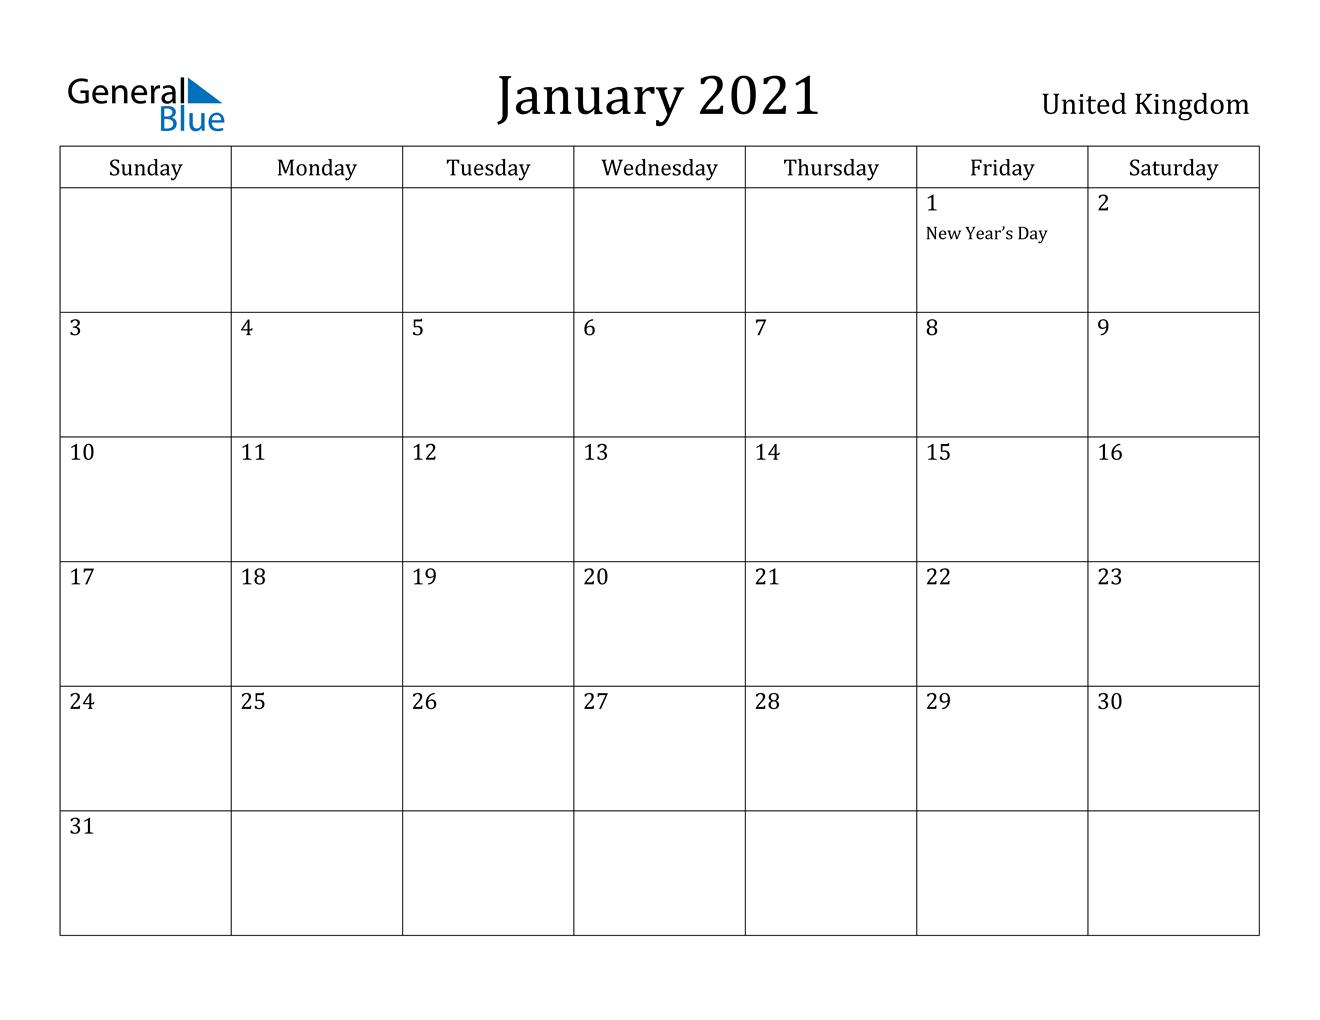 January 2021 Calendar - United Kingdom December 2020 January 2021 Calendar Australia